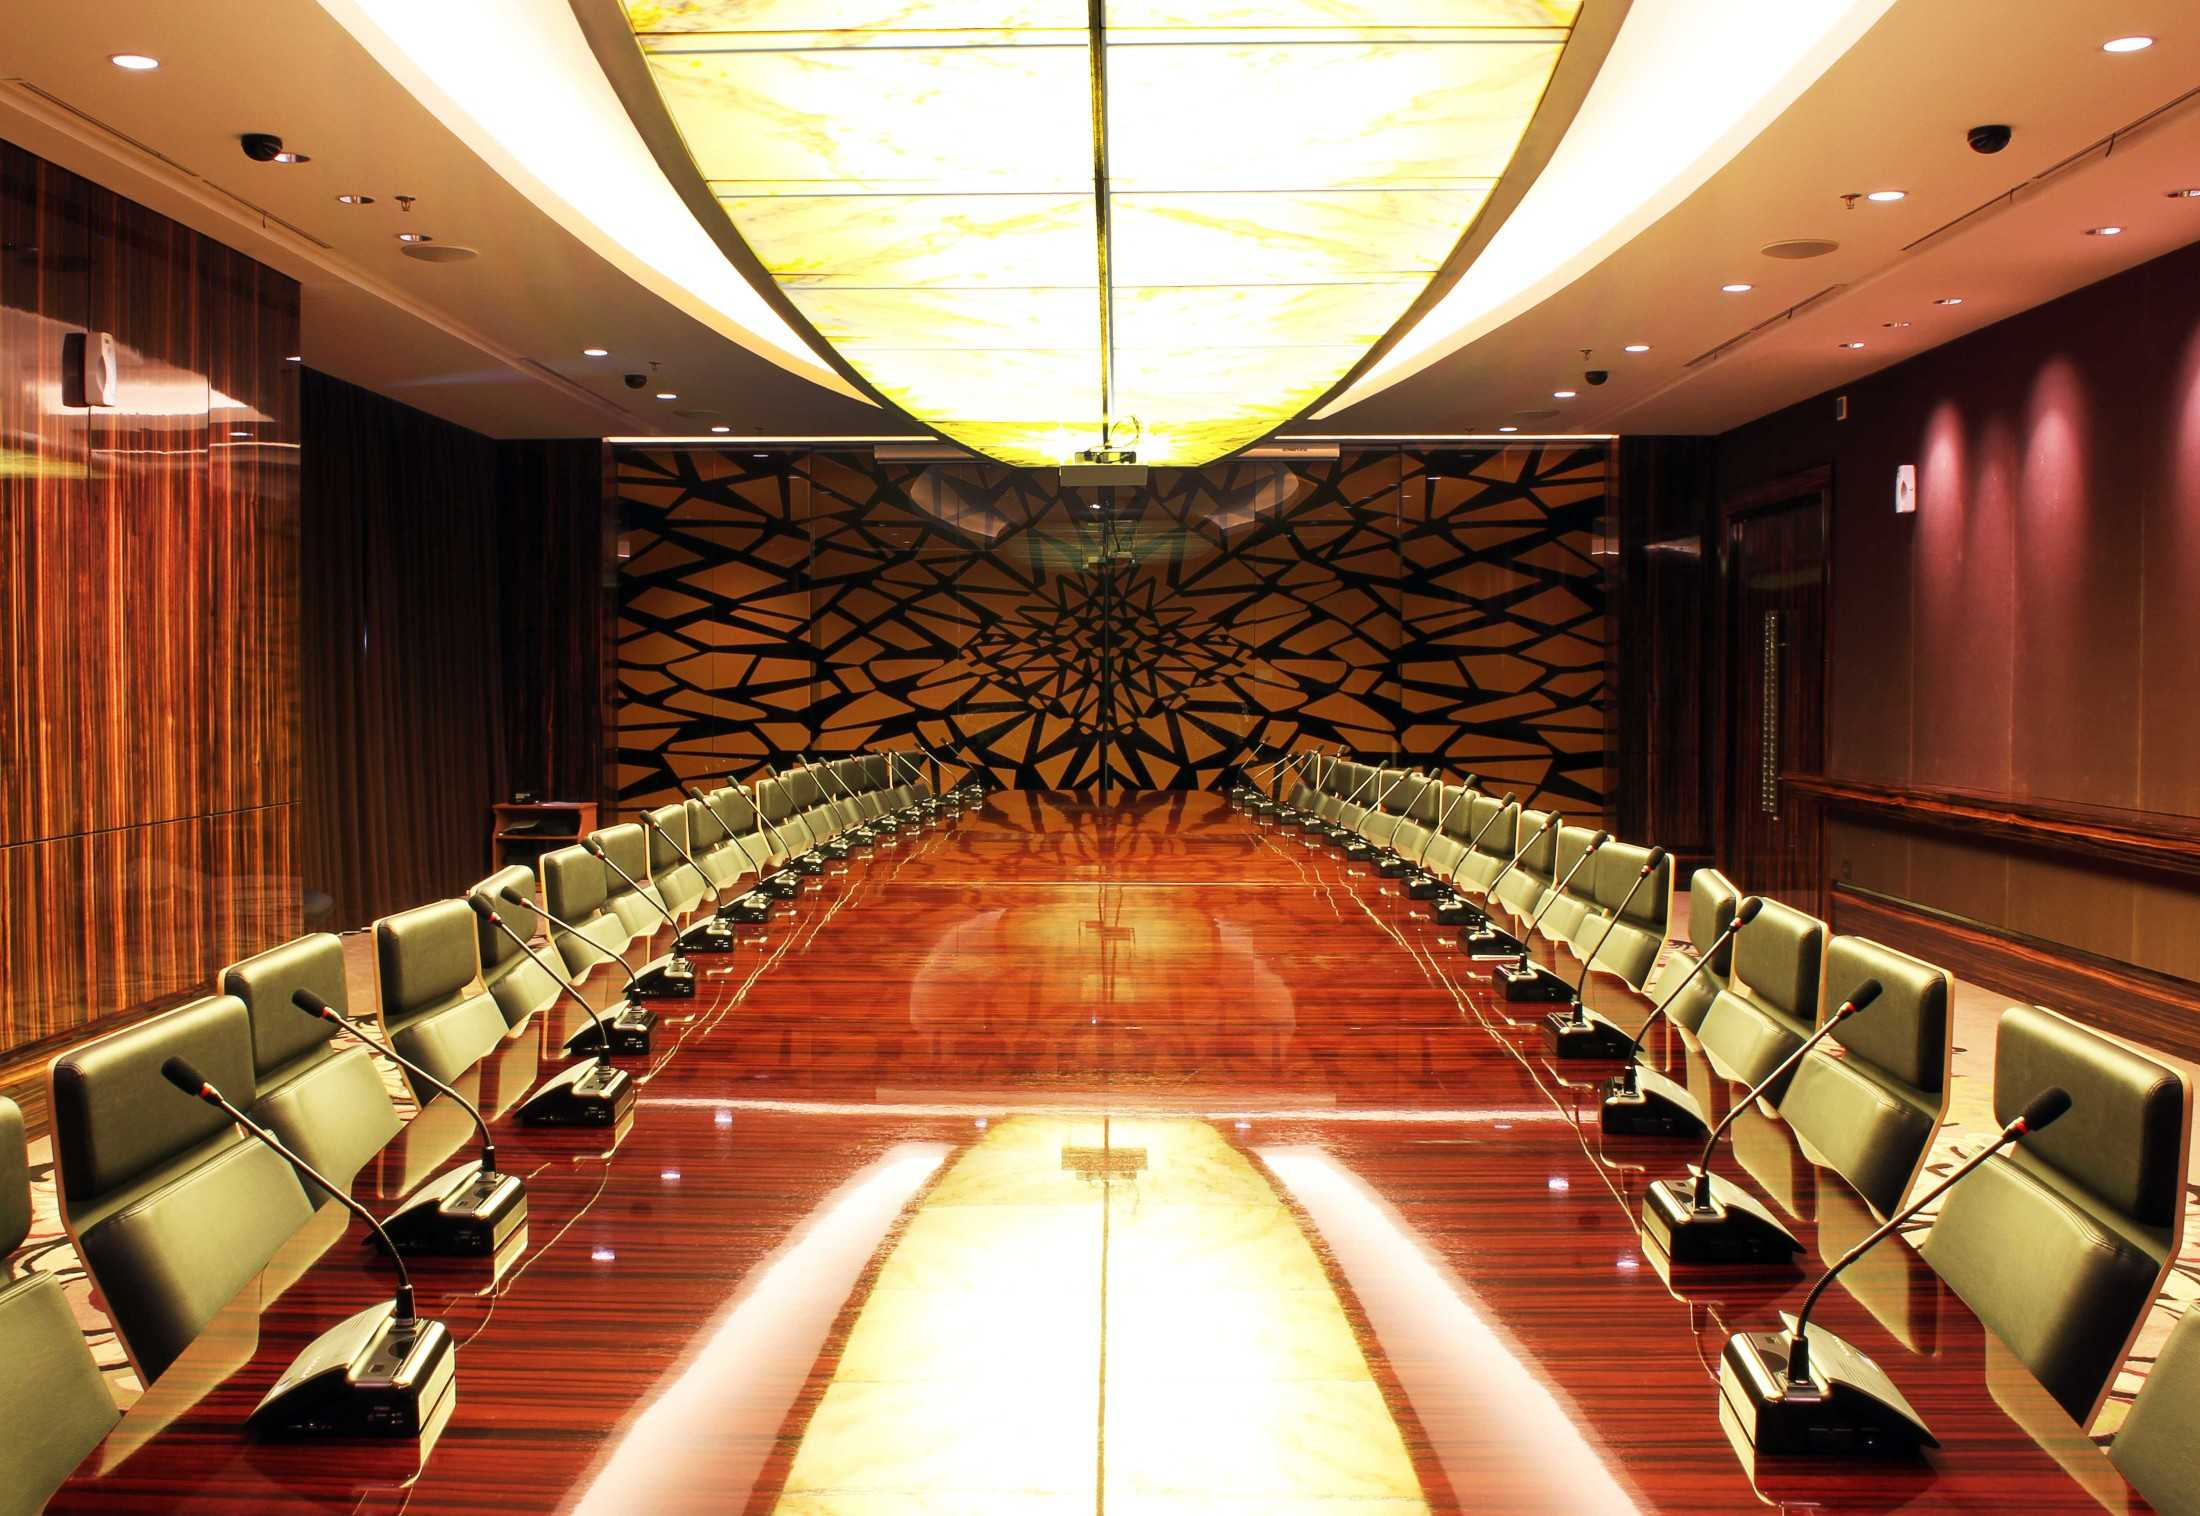 Jasa Interior Desainer Insada Integrated Design Team di Jakarta Barat